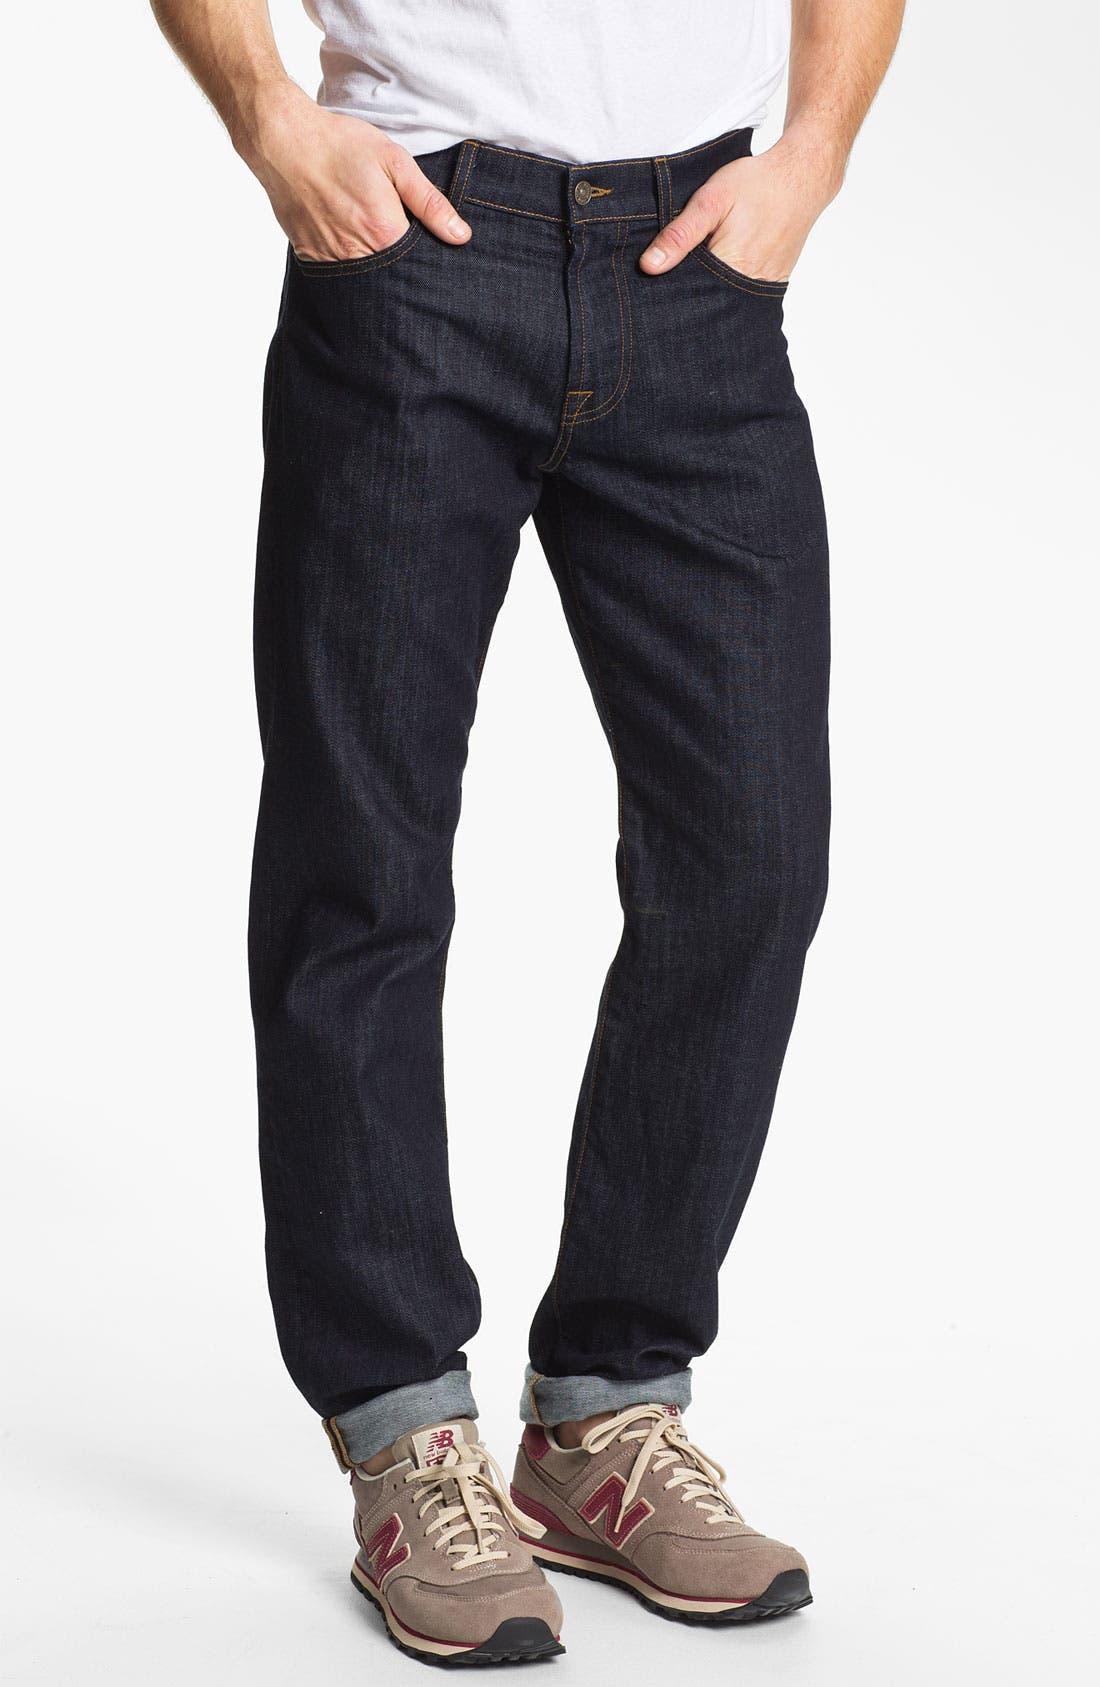 Alternate Image 1 Selected - 7 For All Mankind® 'Carsen' Easy Straight Leg Jeans (Dark Clean)